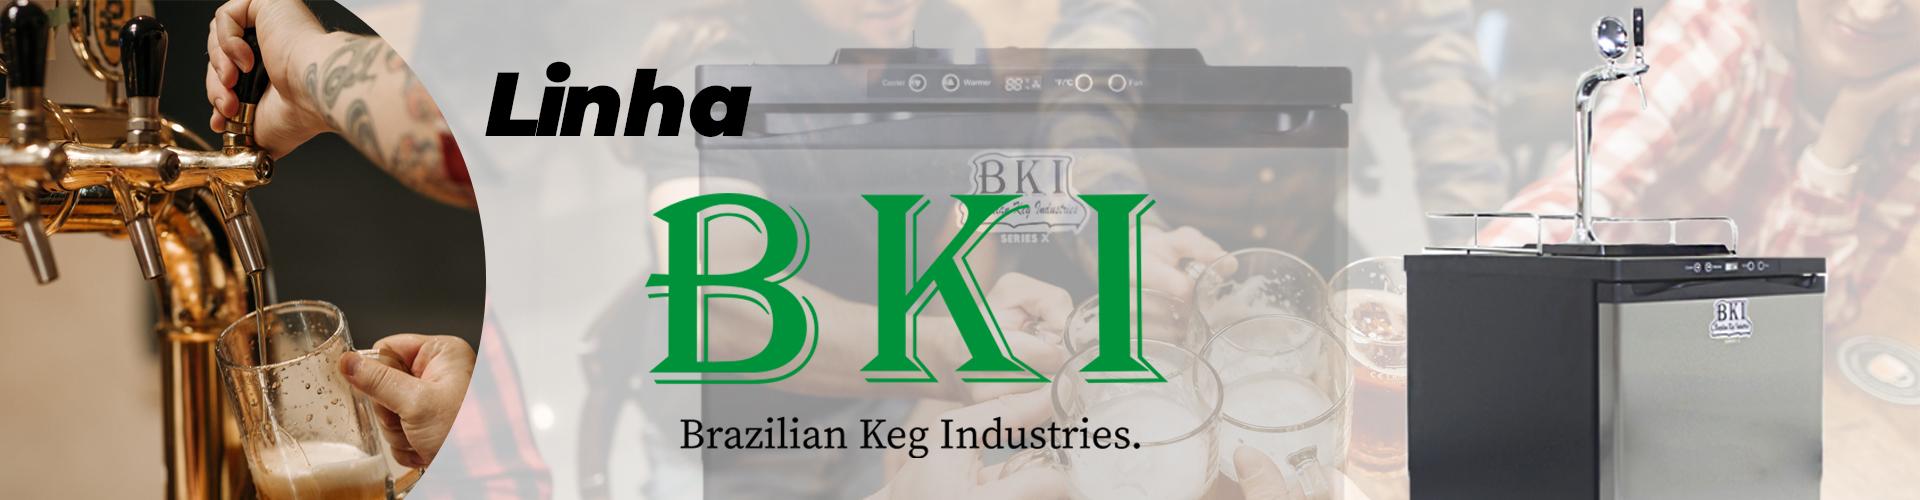 BKI - Brazilian Keg Industries